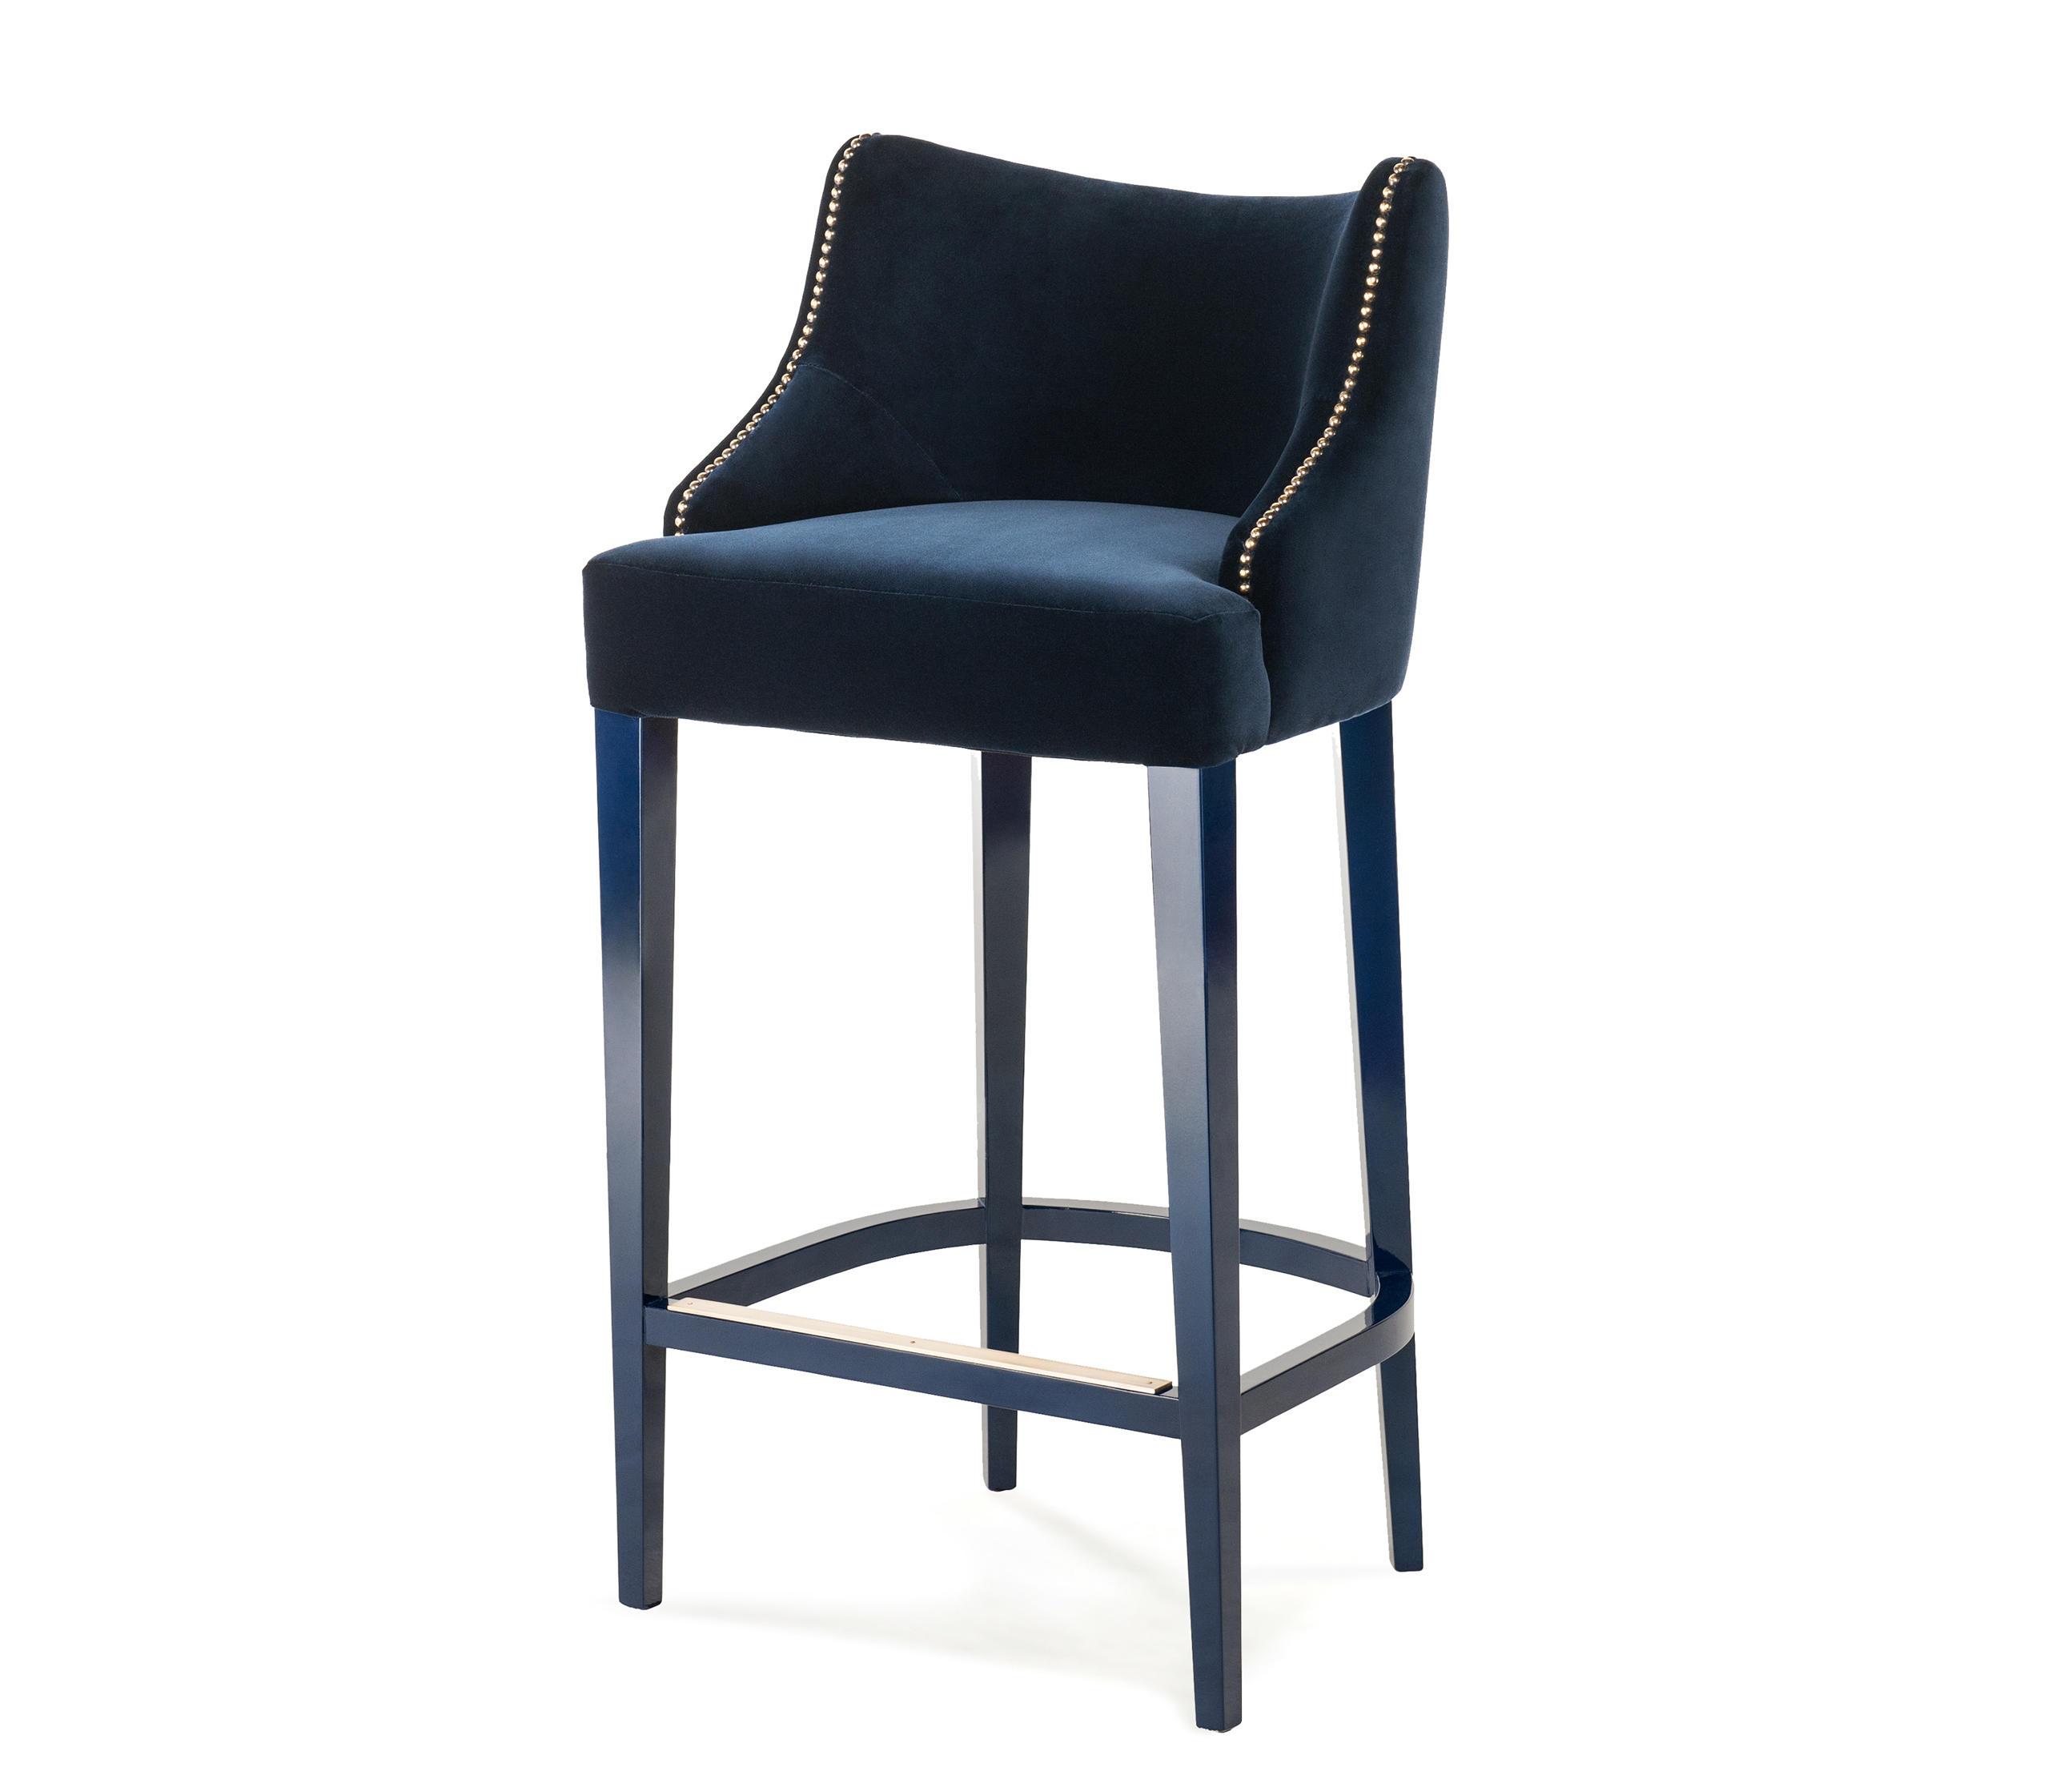 Becomes me bar stool barhocker von munna architonic for Barhocker englisch